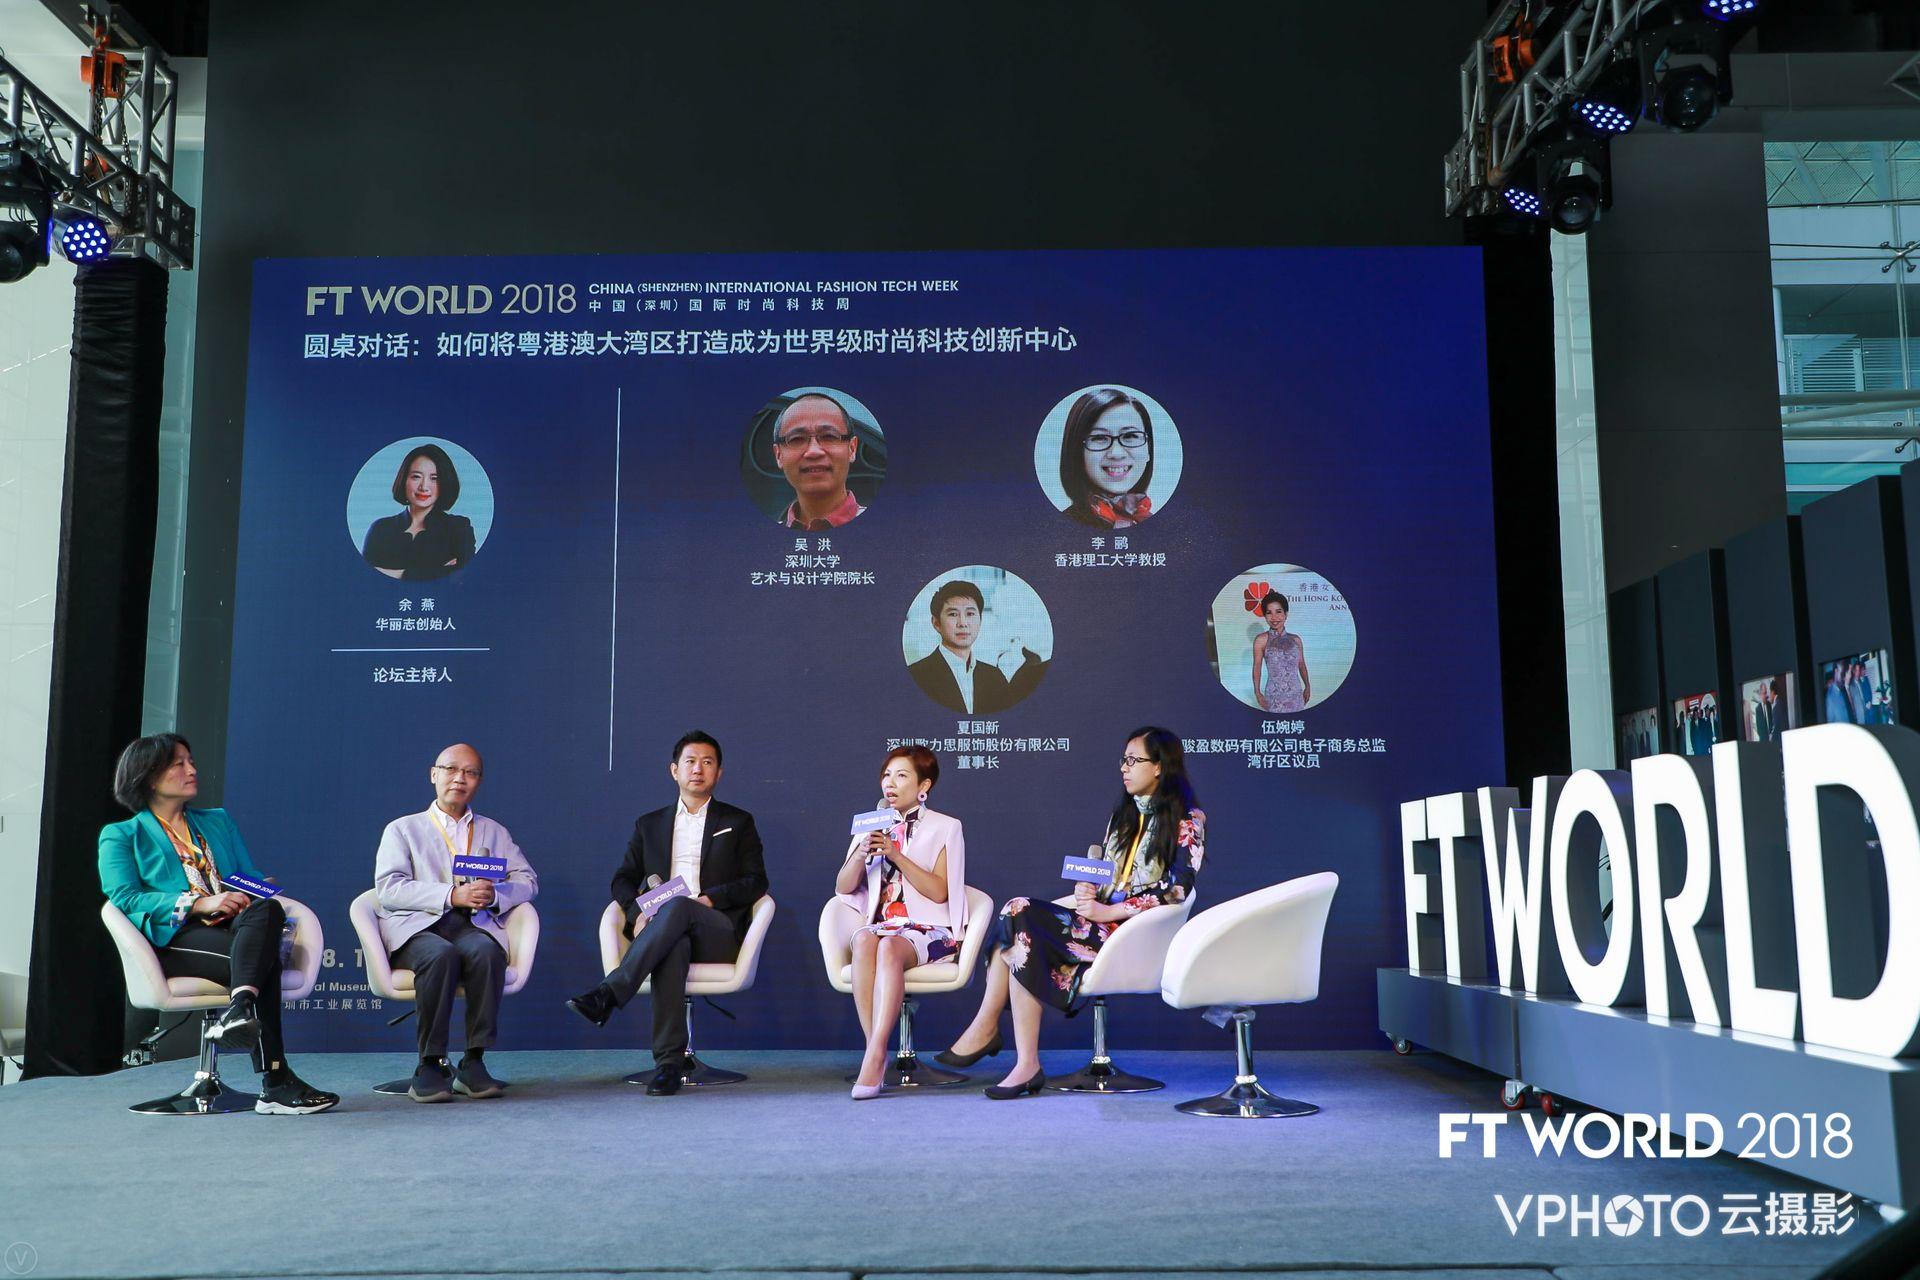 TF WORLD 2018 国际时尚科技周